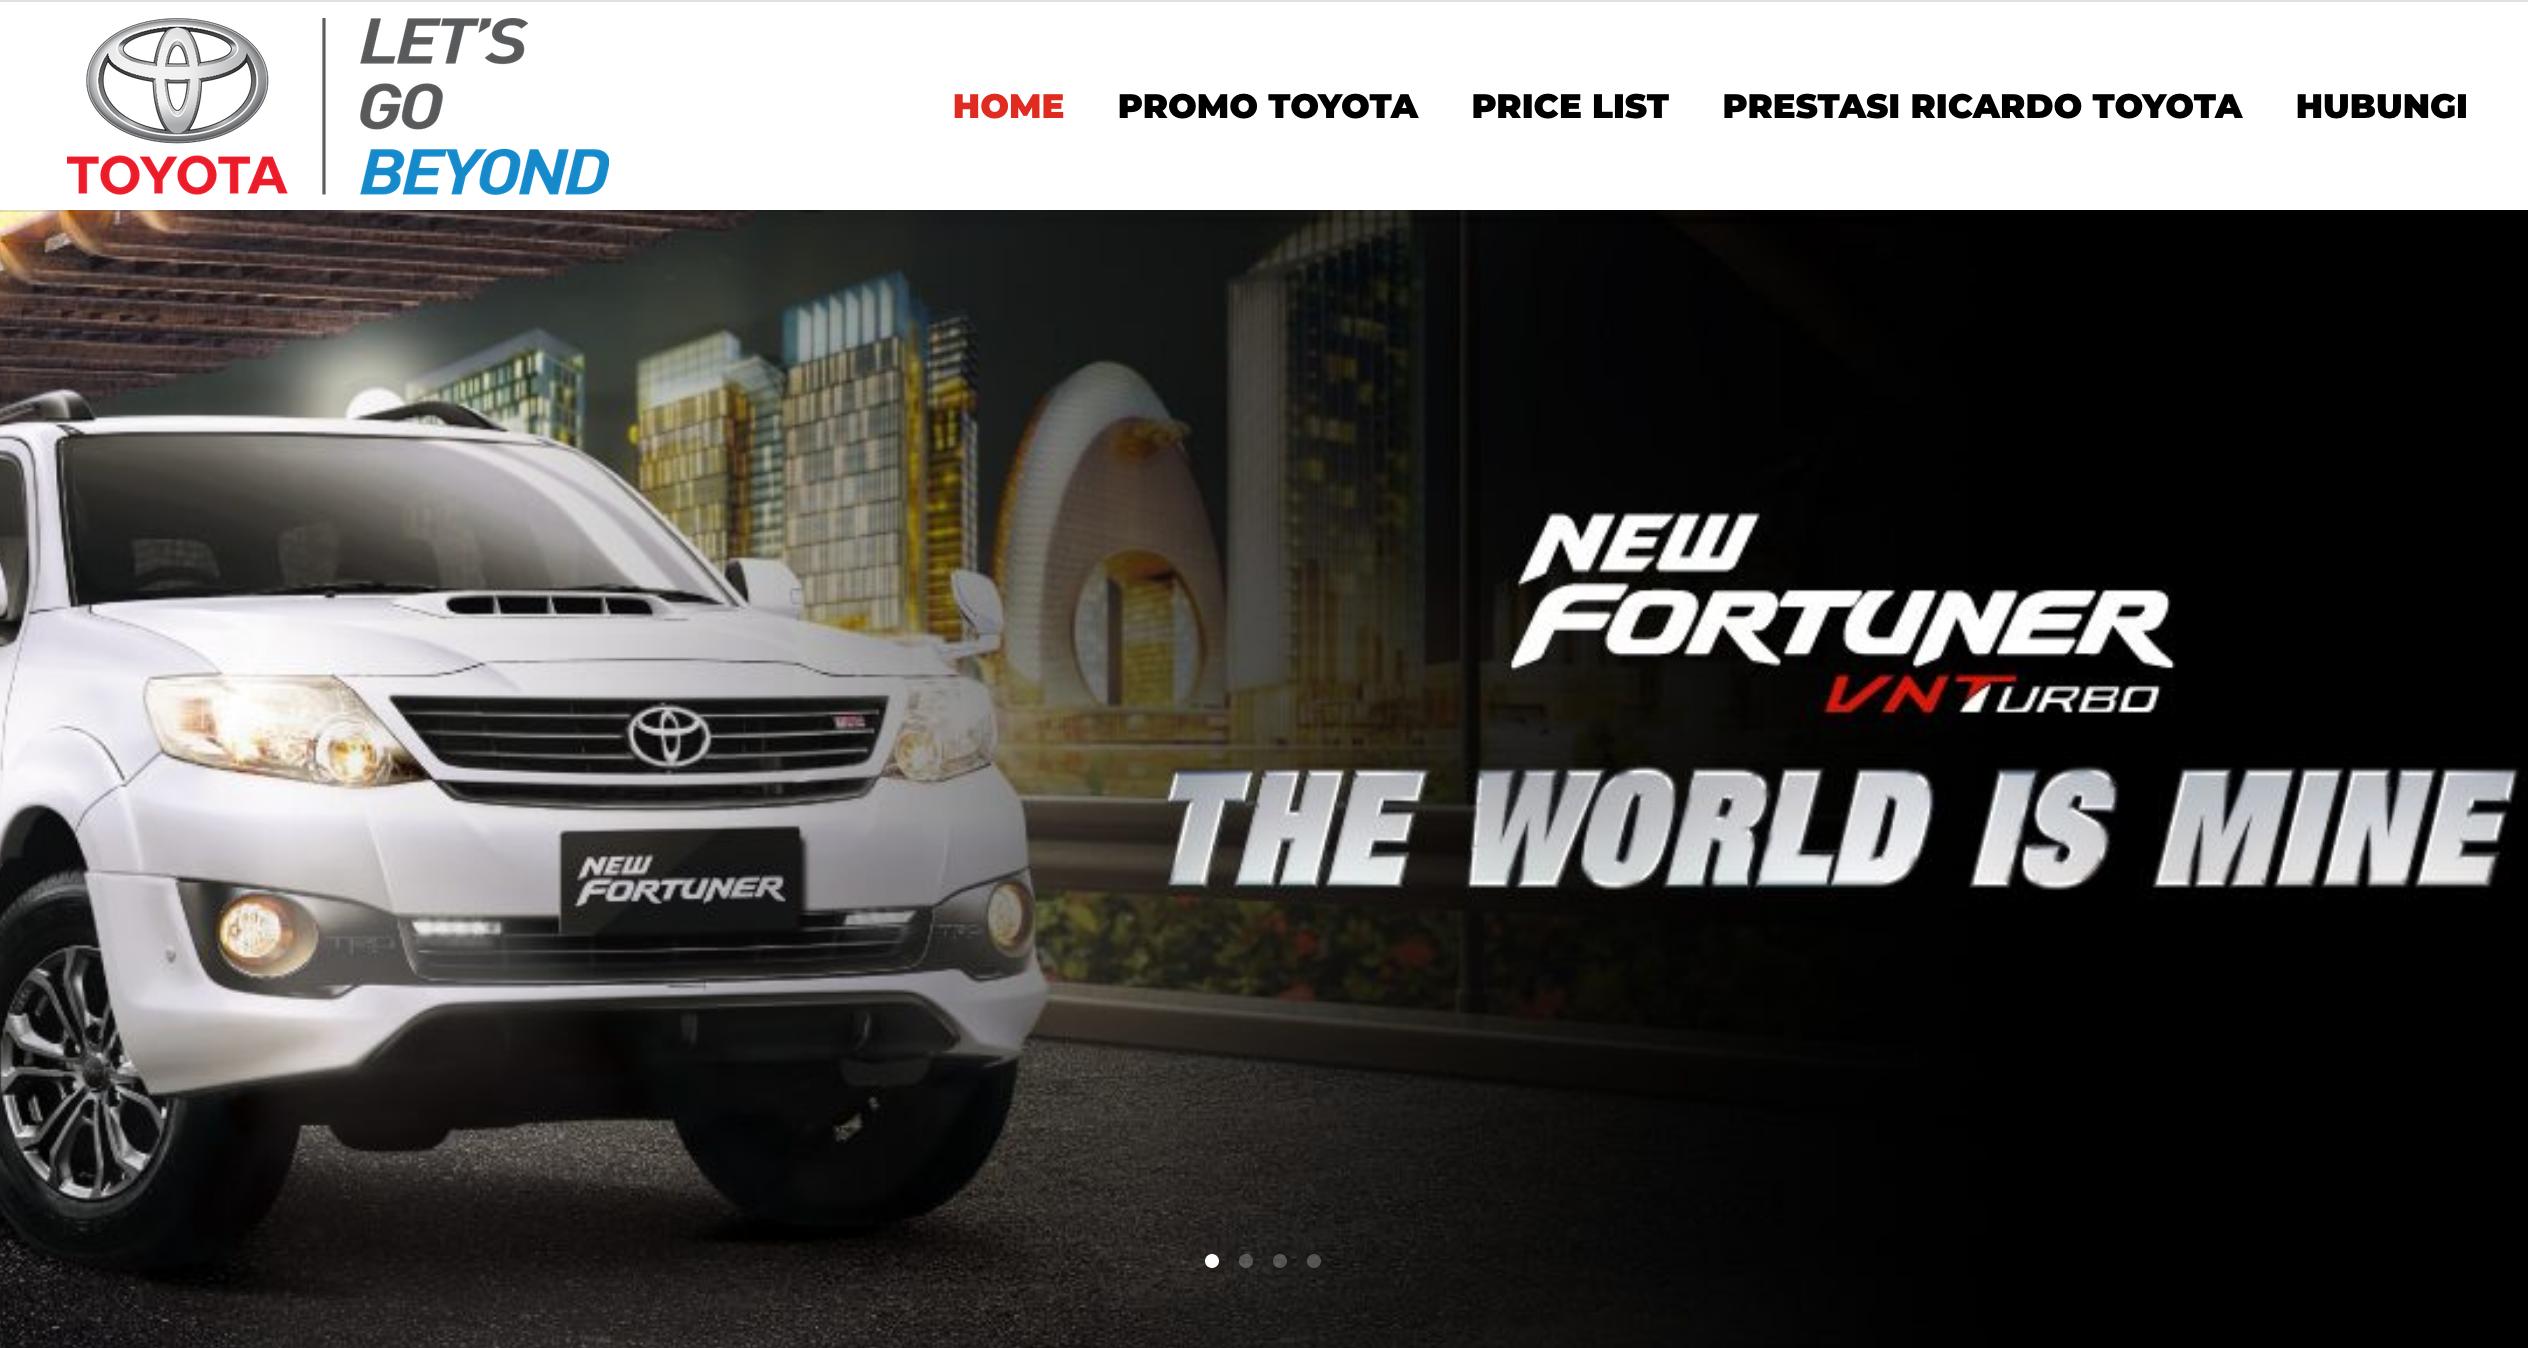 Study Case: Ricardo Toyota - Toyota Indonesia